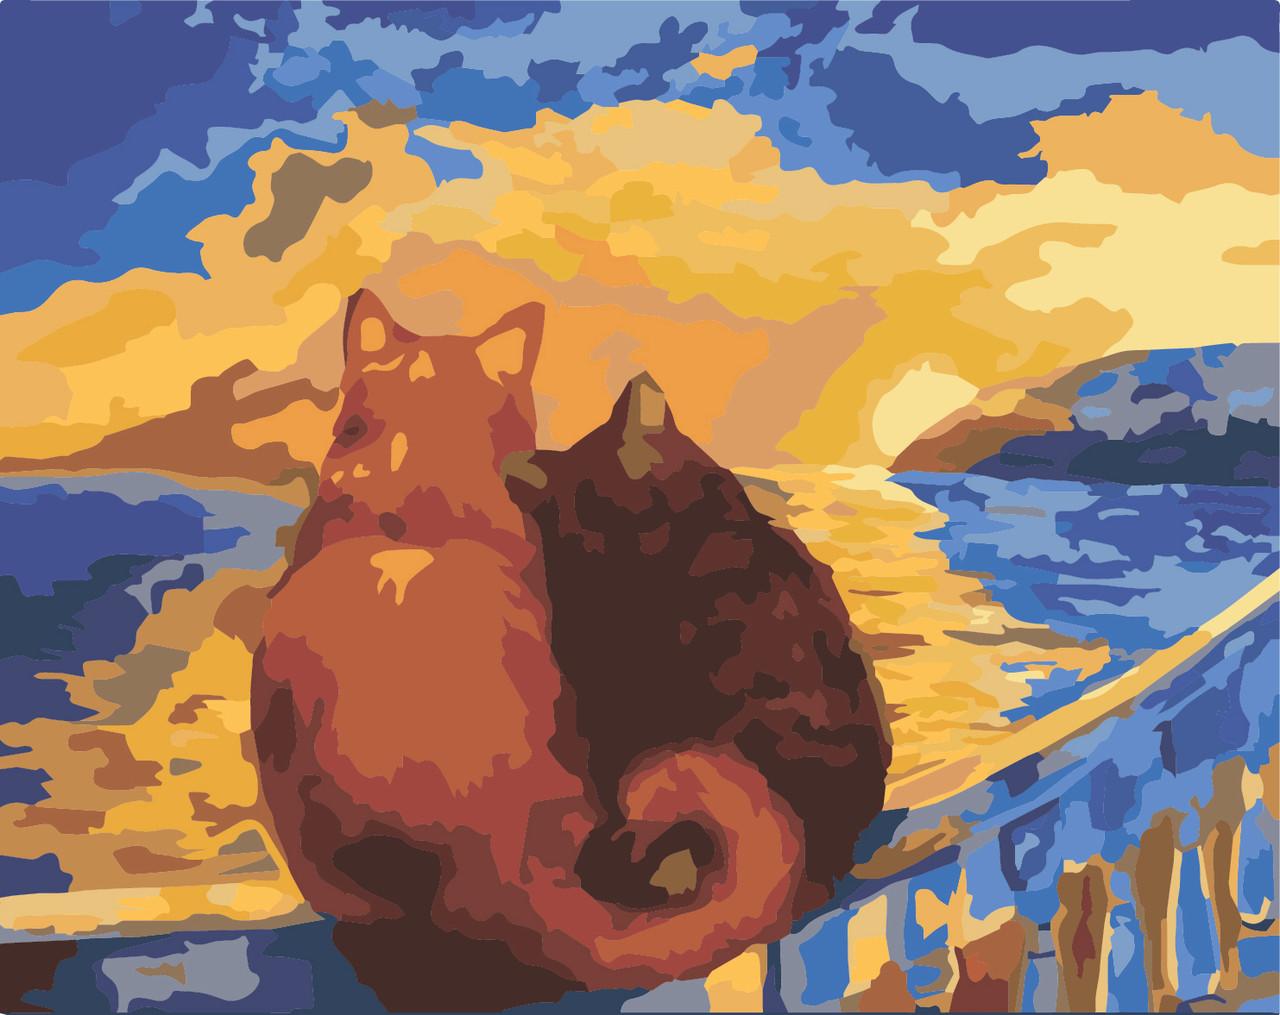 Живопись по номерам Идейка Коты на закате (KHO2438) 40 х 50 см (без коробки)